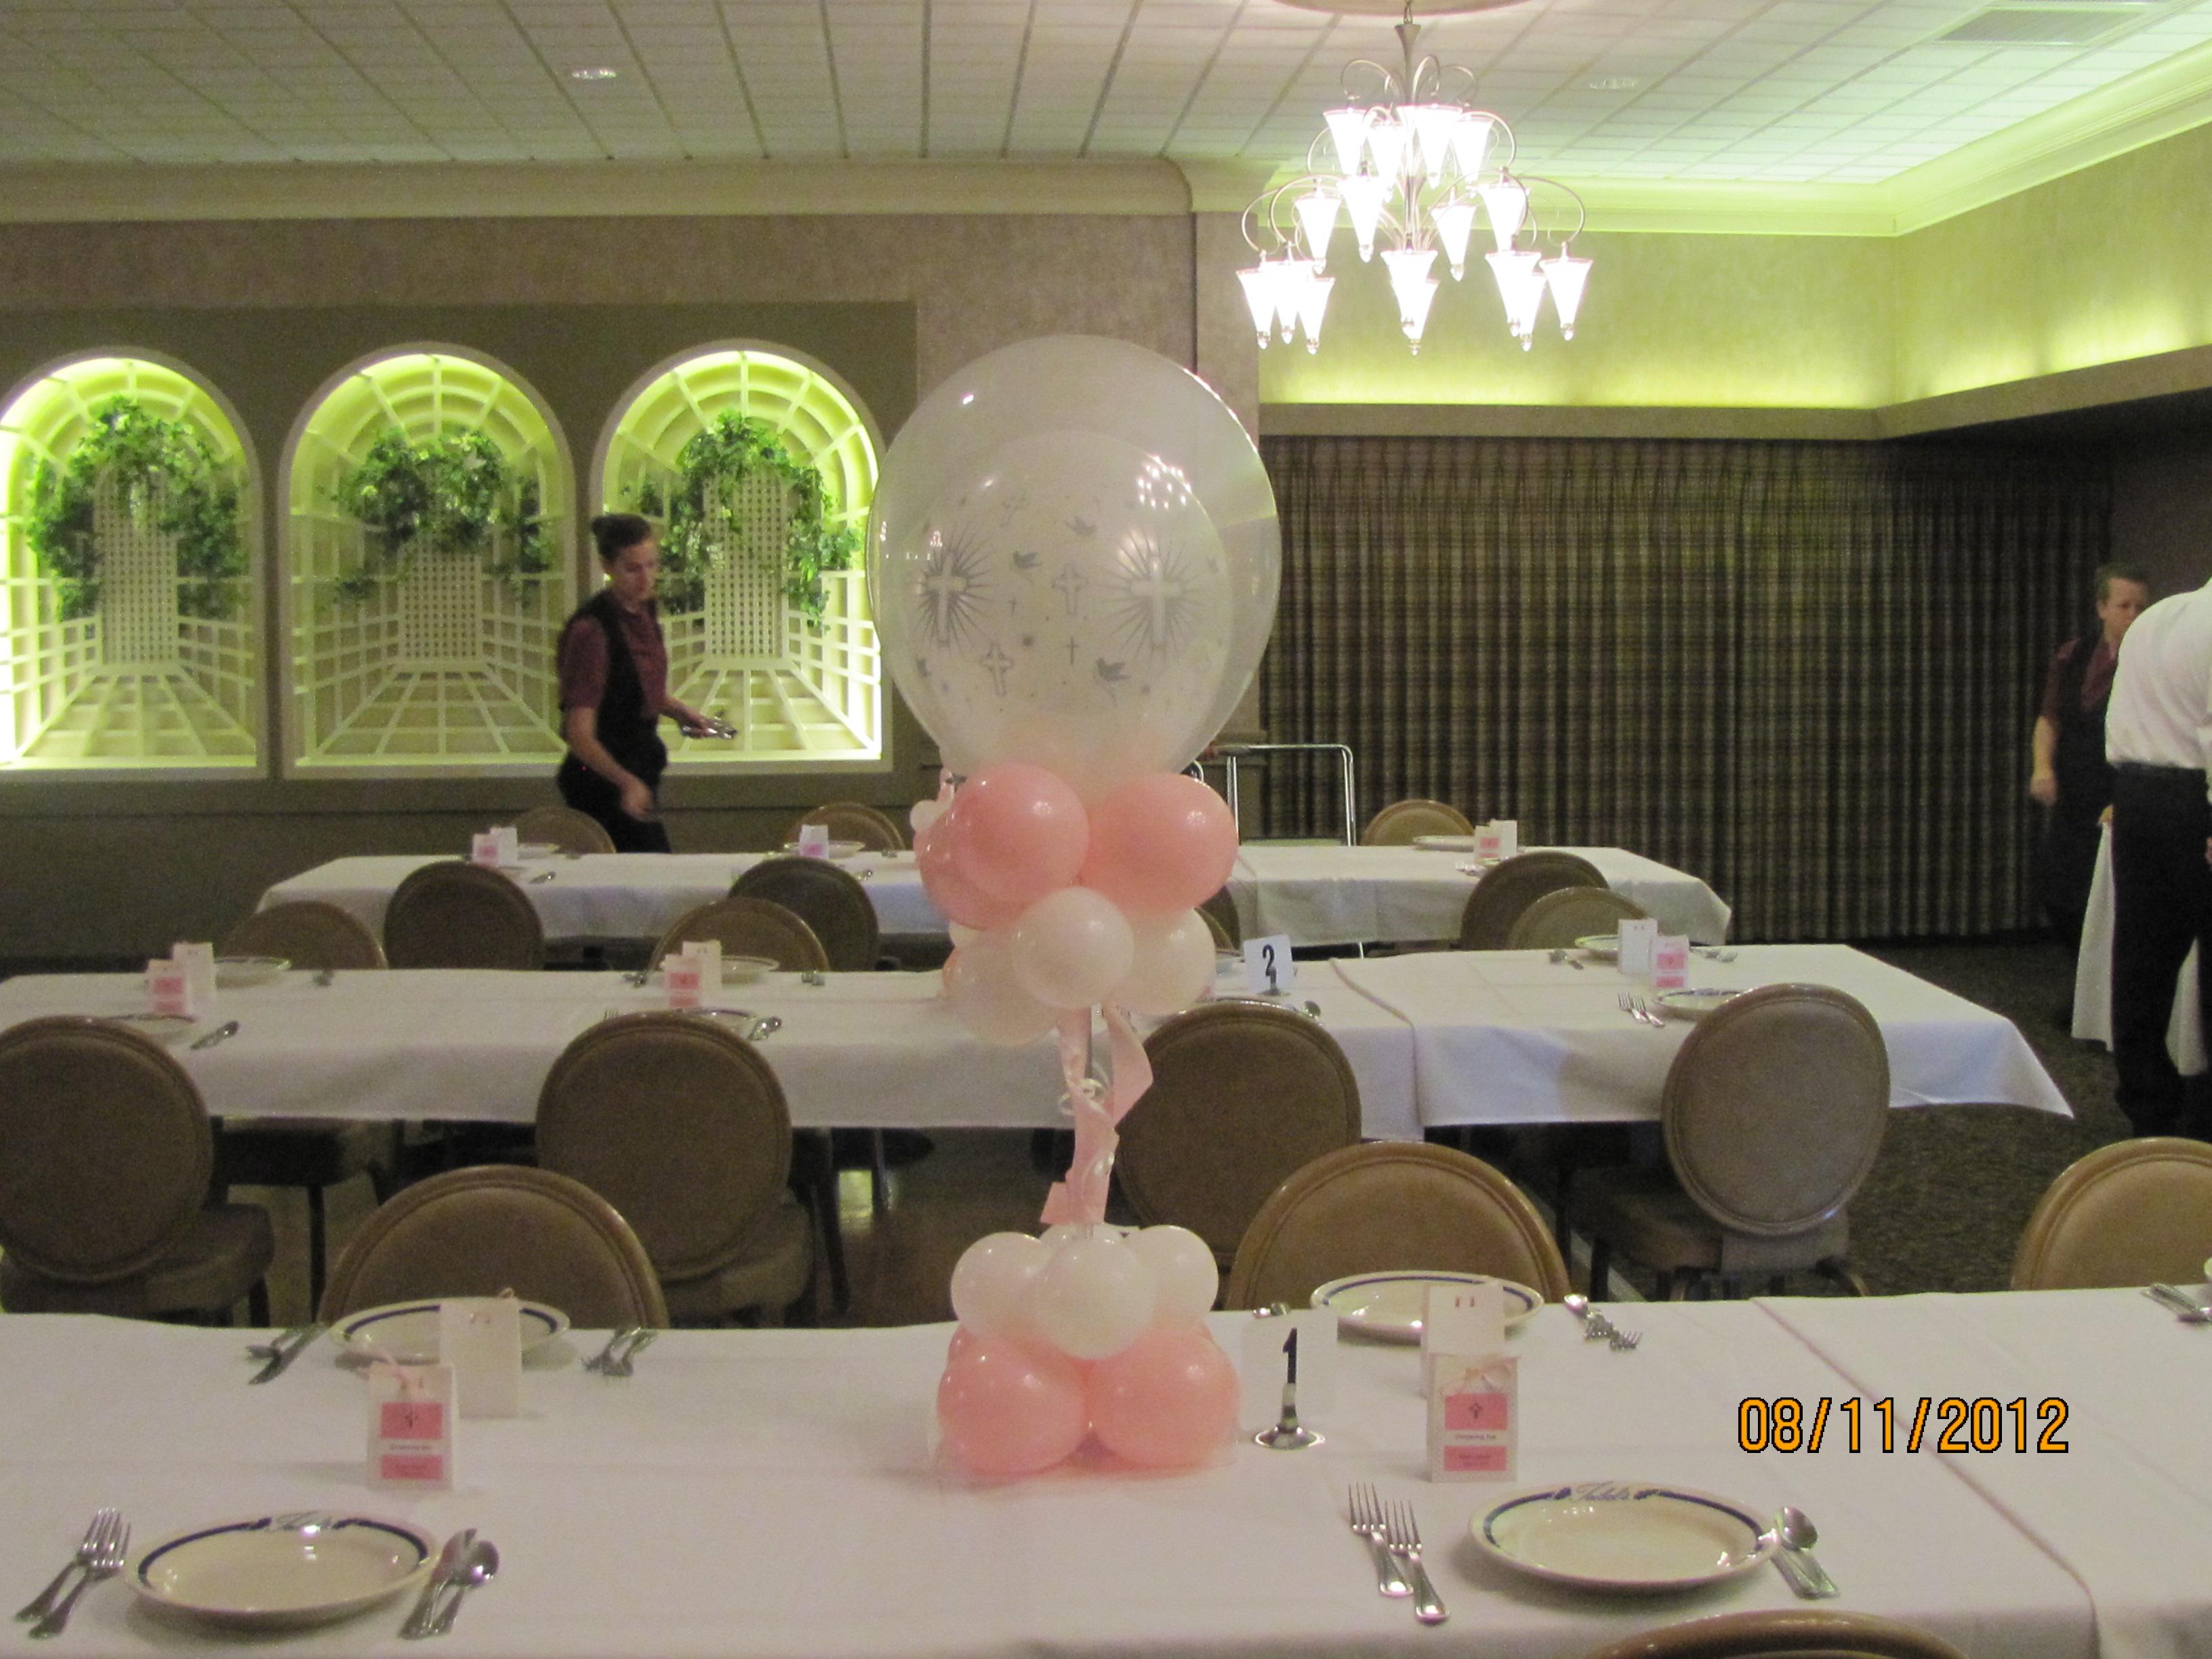 Religious balloon decorations